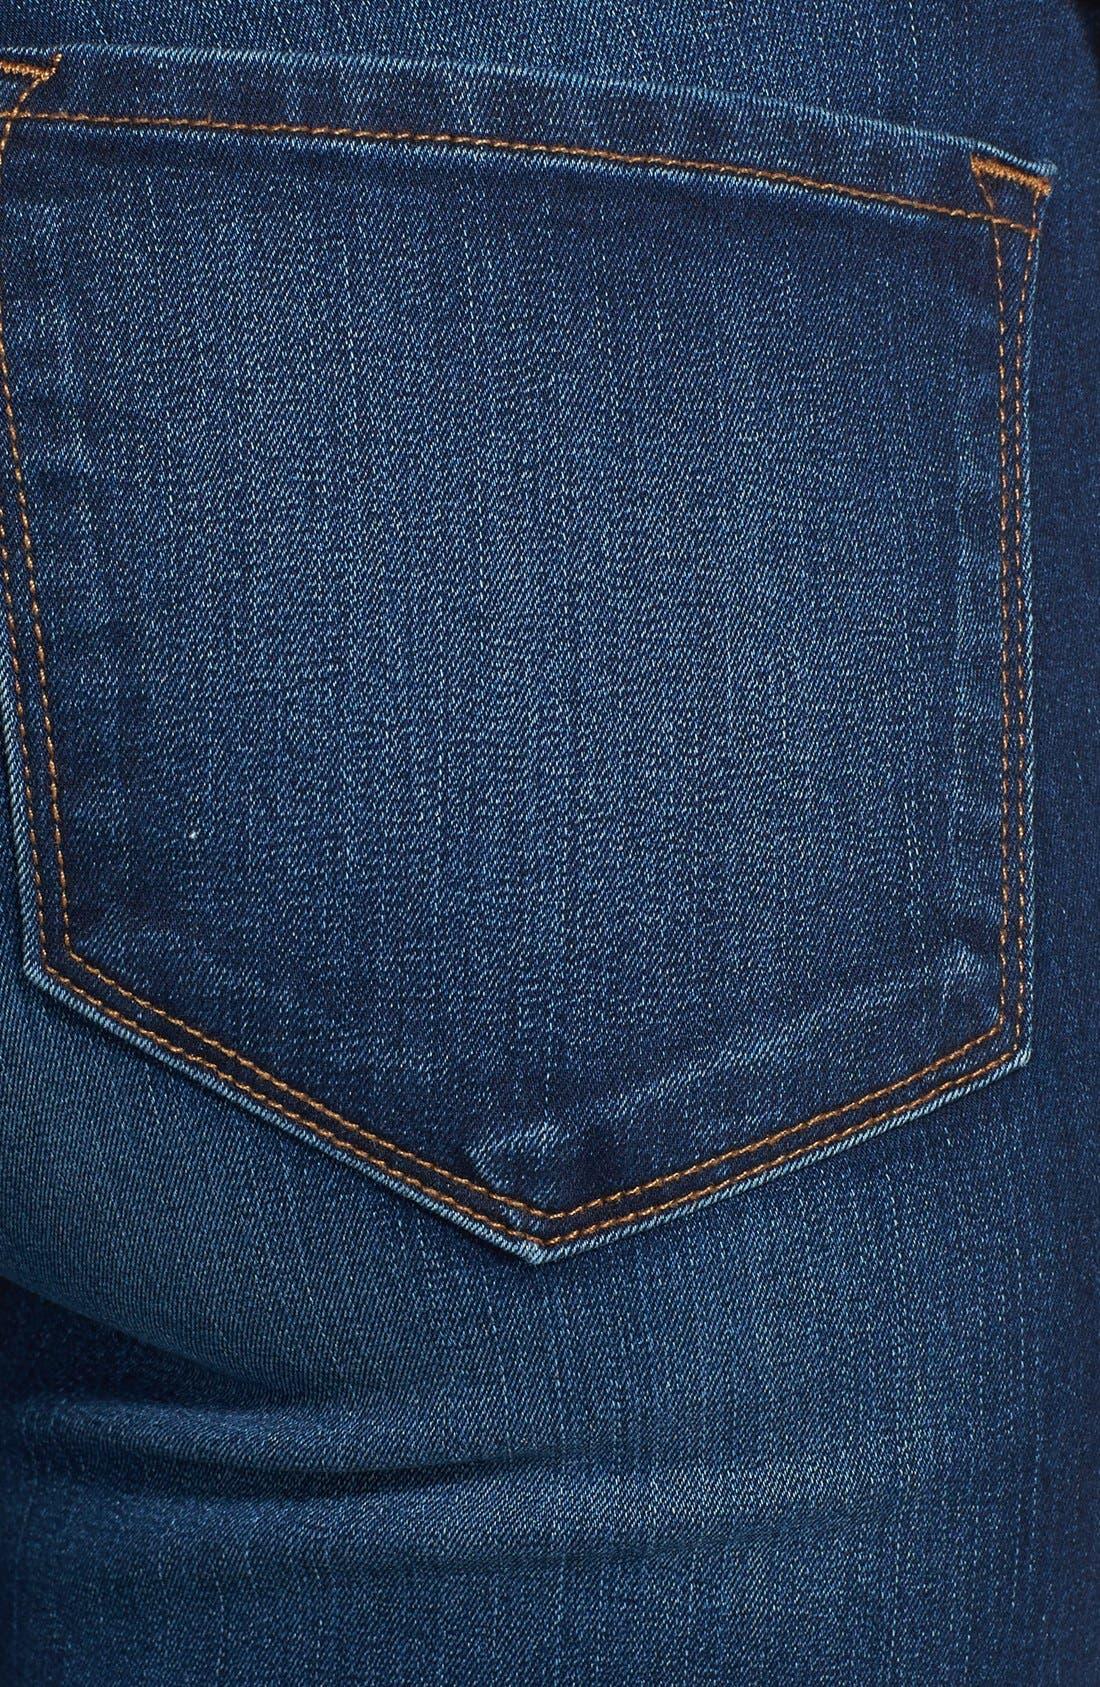 Alternate Image 3  - J Brand '811' Skinny Stretch Jeans (Saltwater)